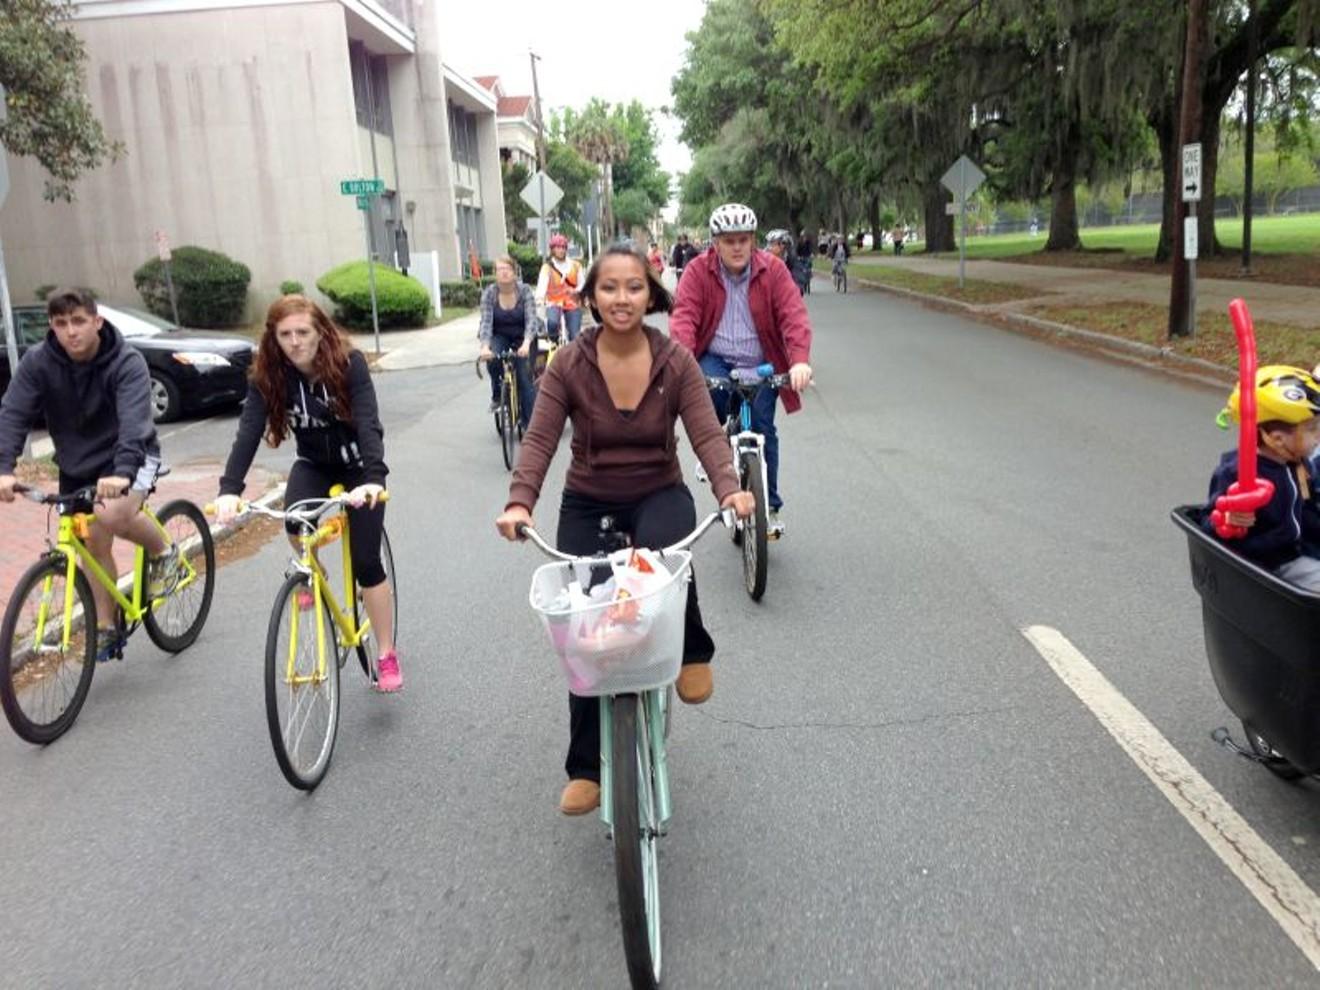 cg_bikes_photo.jpg